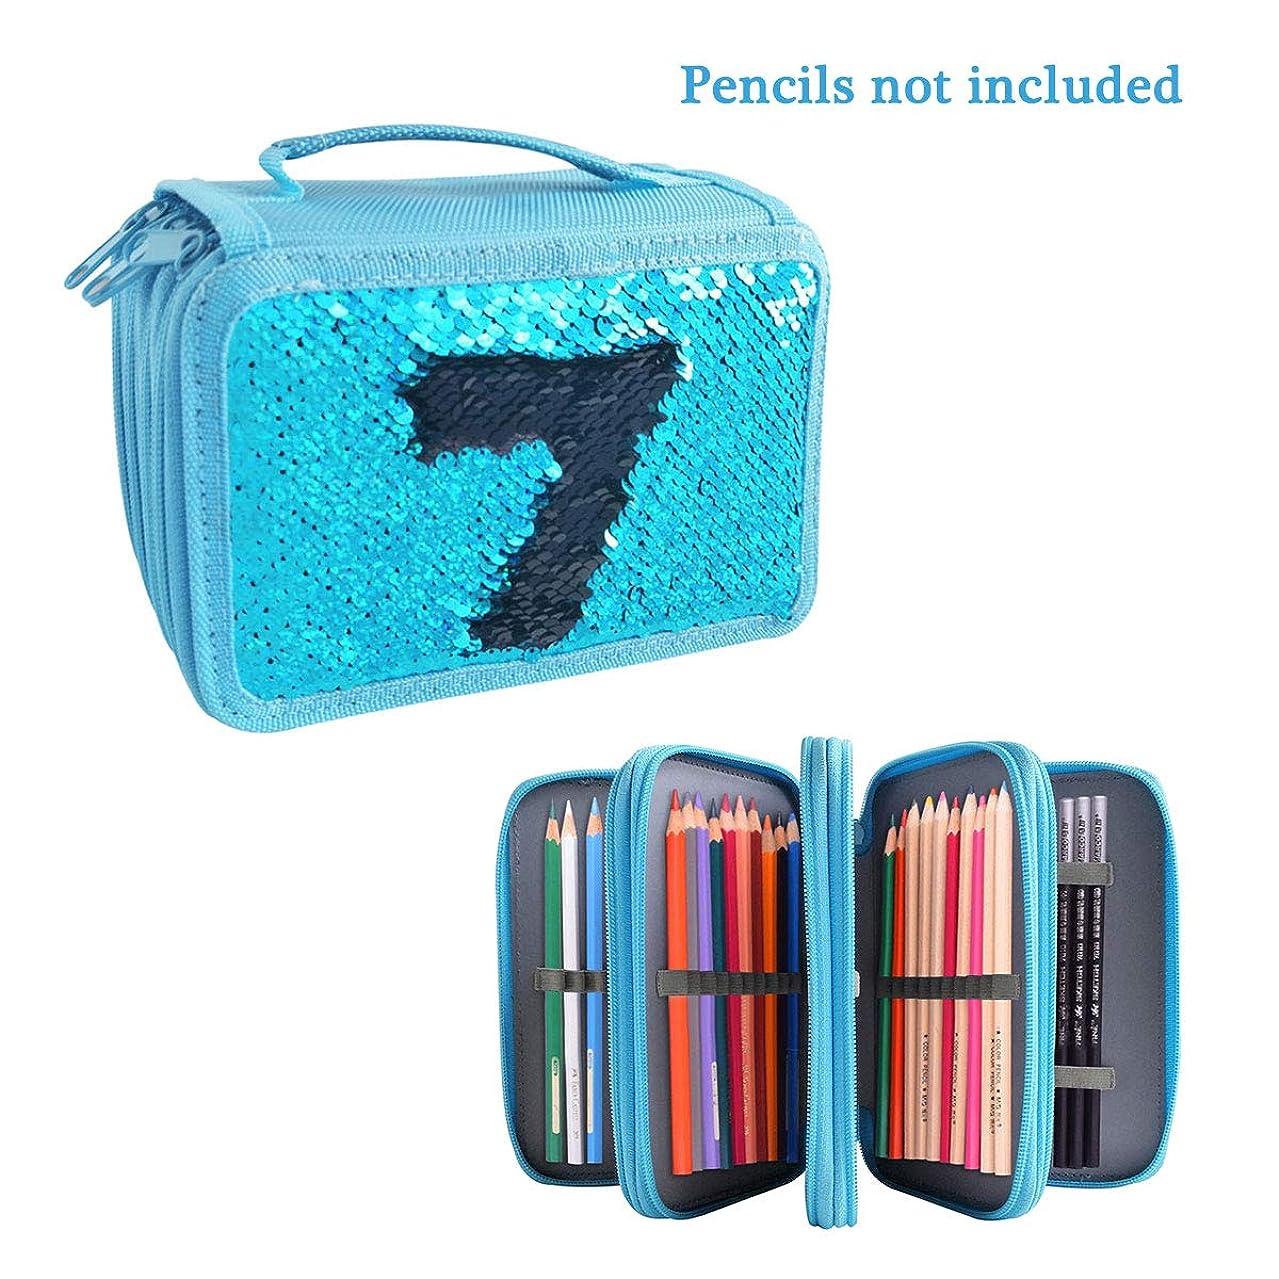 Flip SparkleBlue Sequin 72 Slots Pencil Case Holder 4 Layers Colored Pen Organizer Bag Cosmetic Brush Pouch